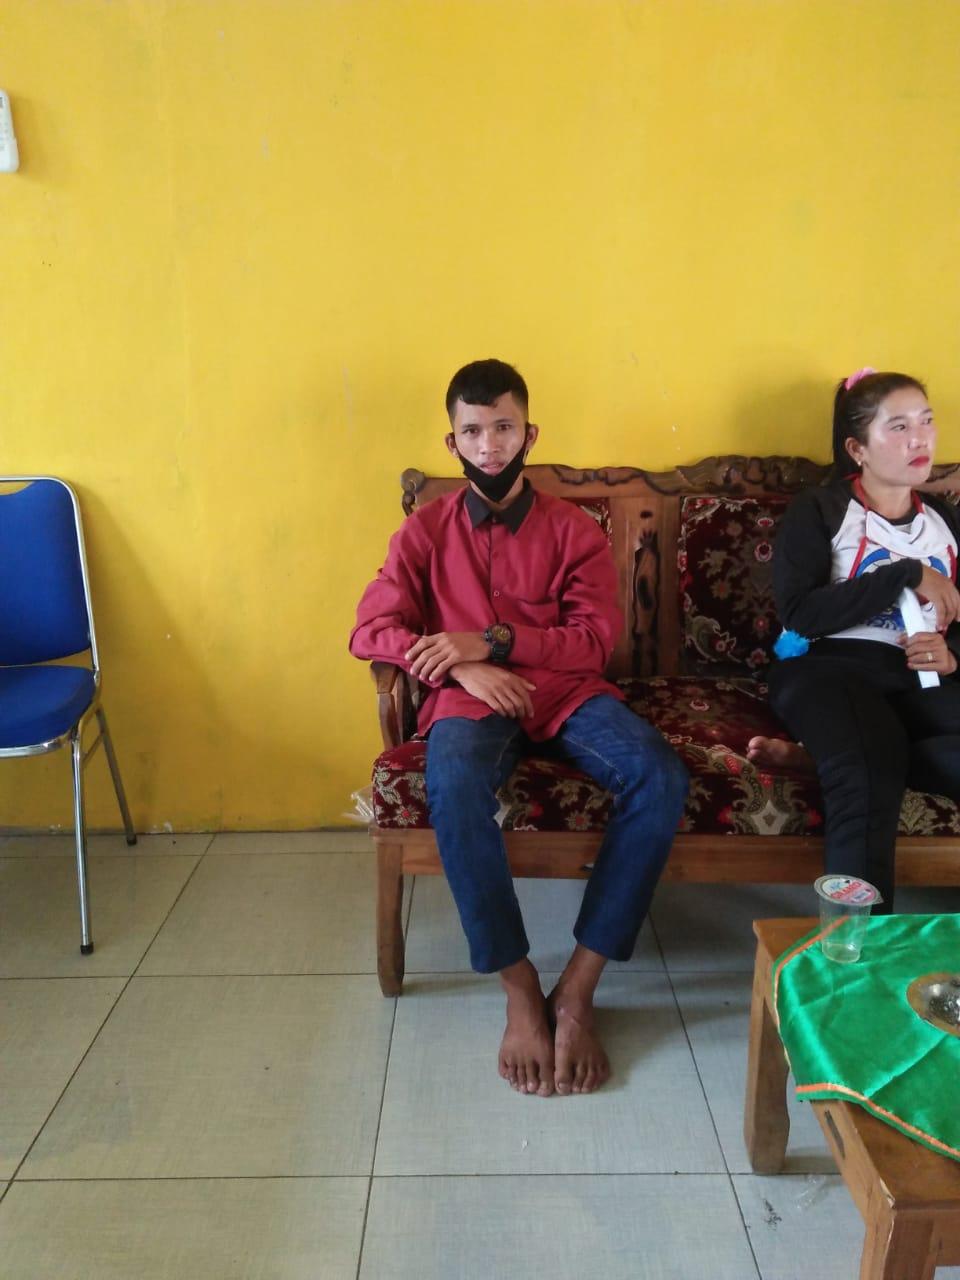 Pengantin Wanita Menolak Menikah, Tokoh Adat Akan Menuntutnya Secara Hukum